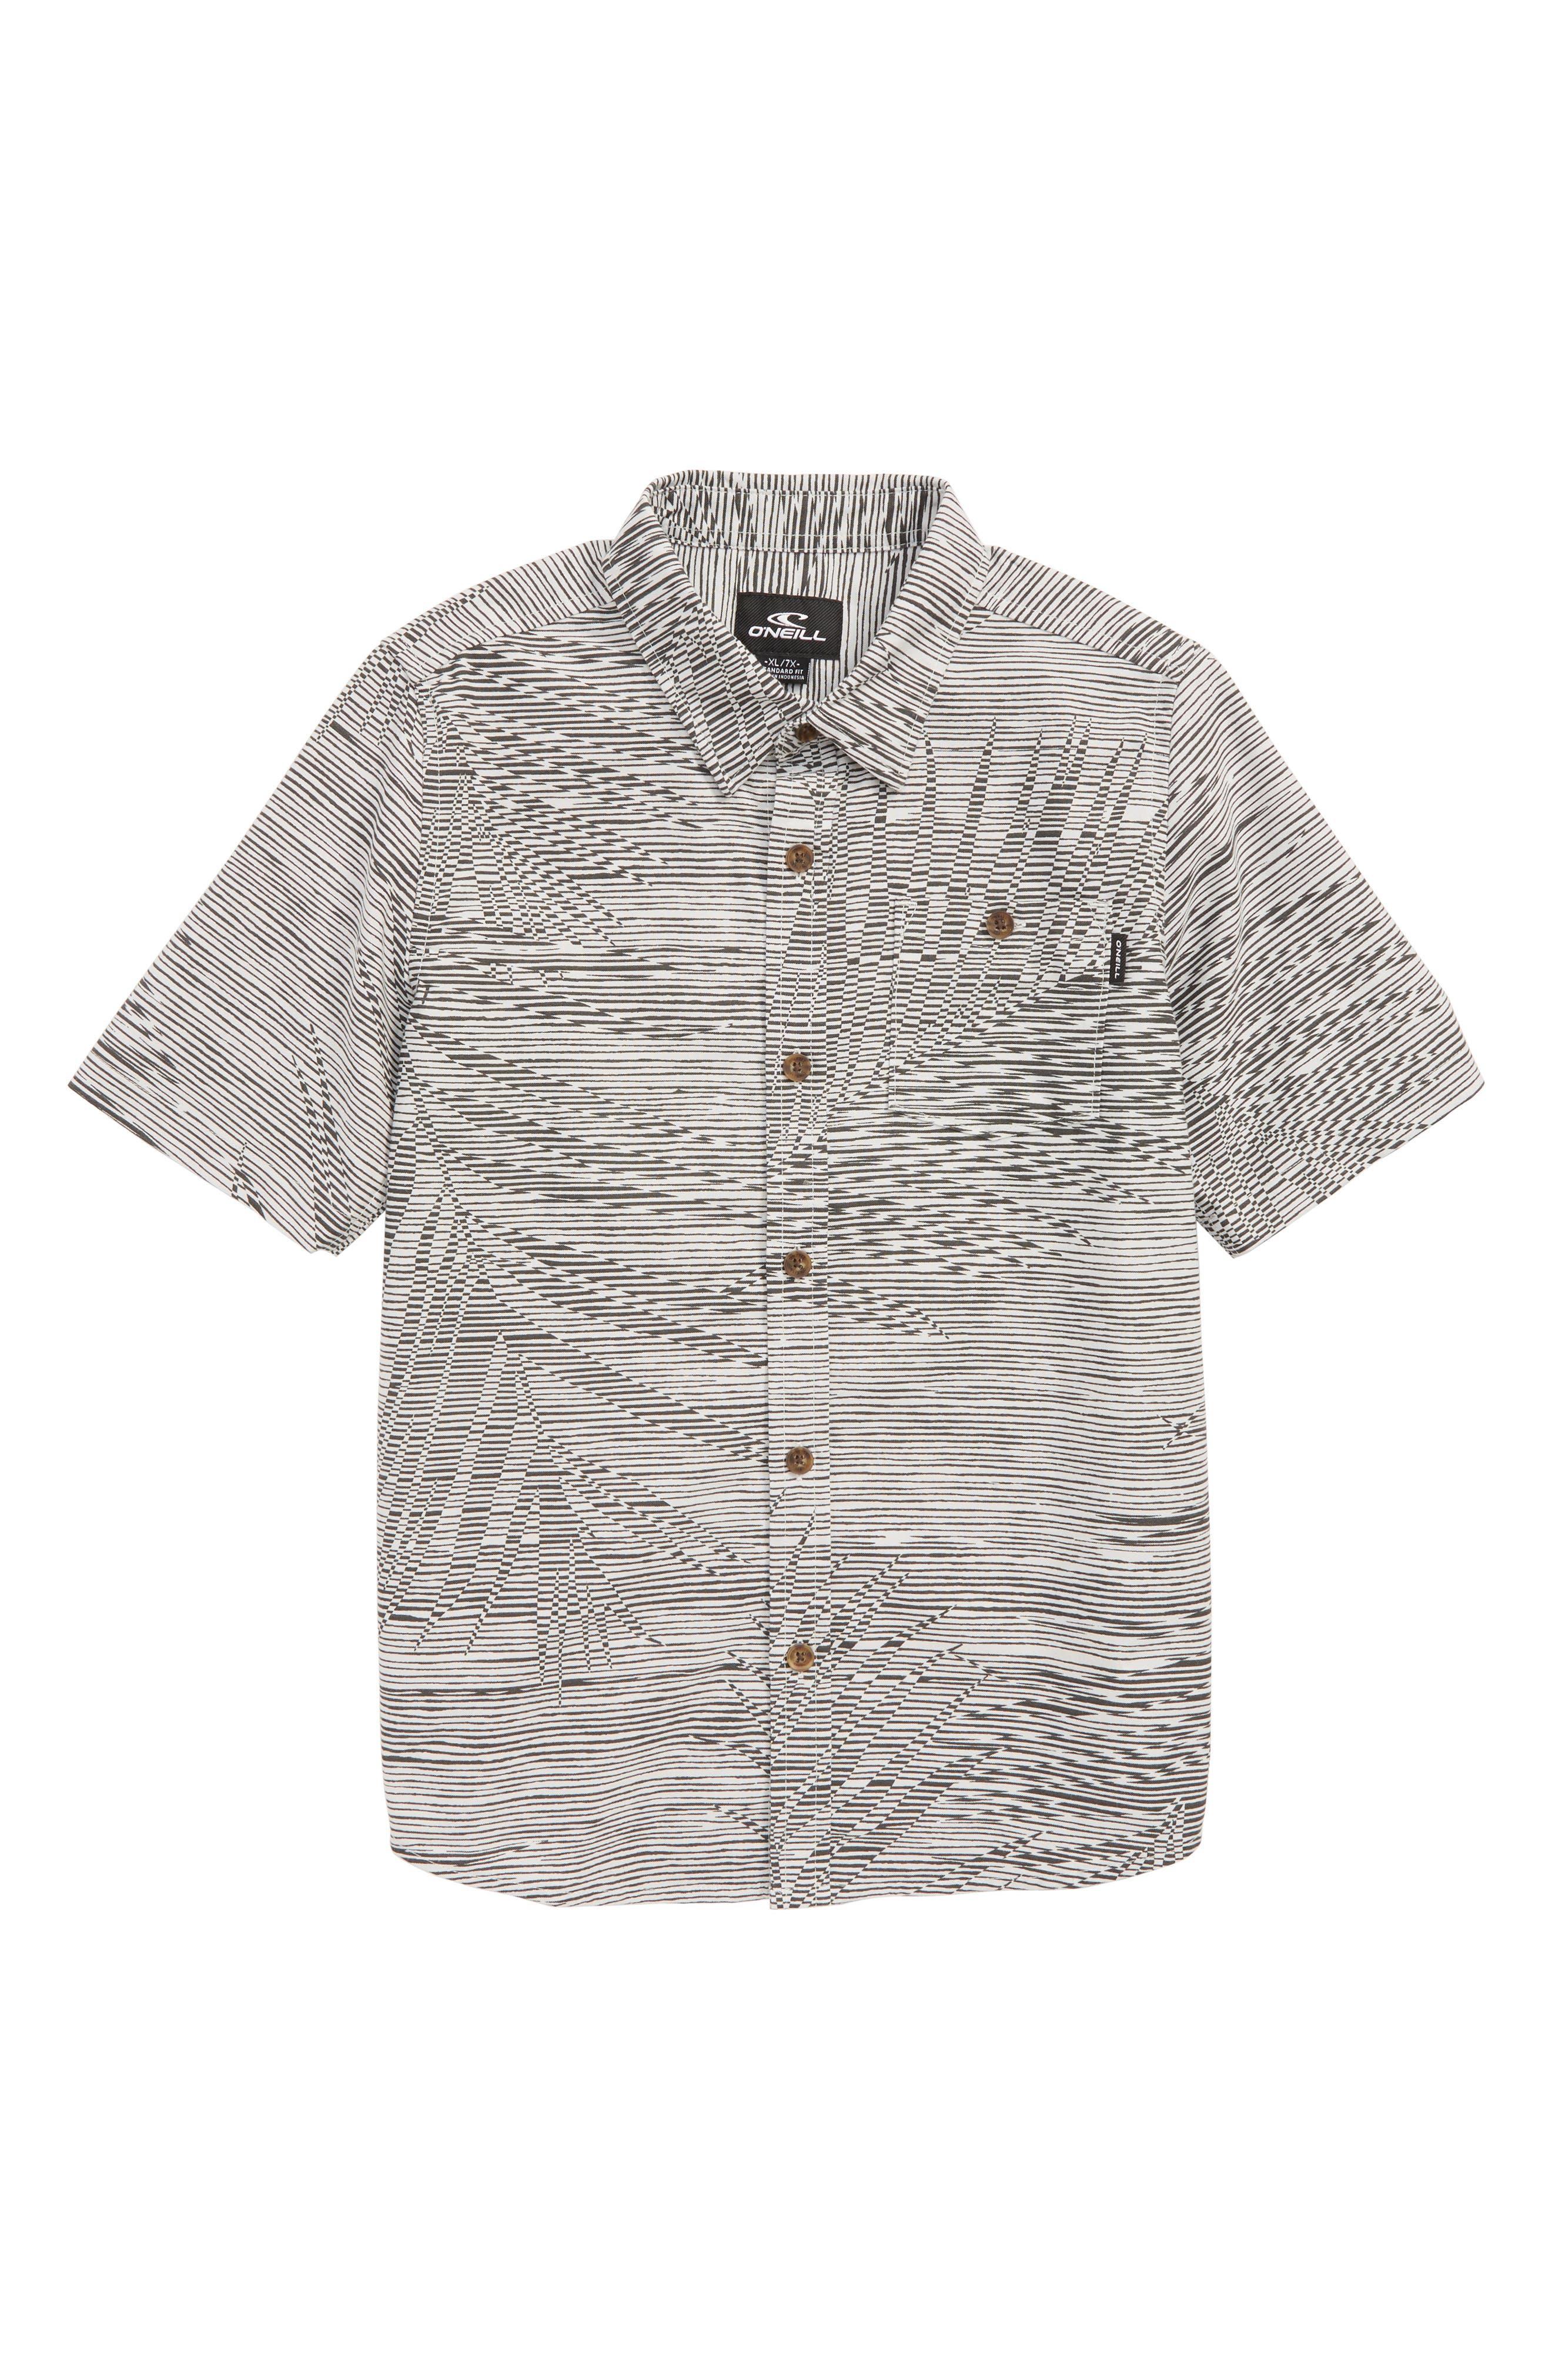 Fronzarelli Woven Shirt,                             Main thumbnail 1, color,                             036